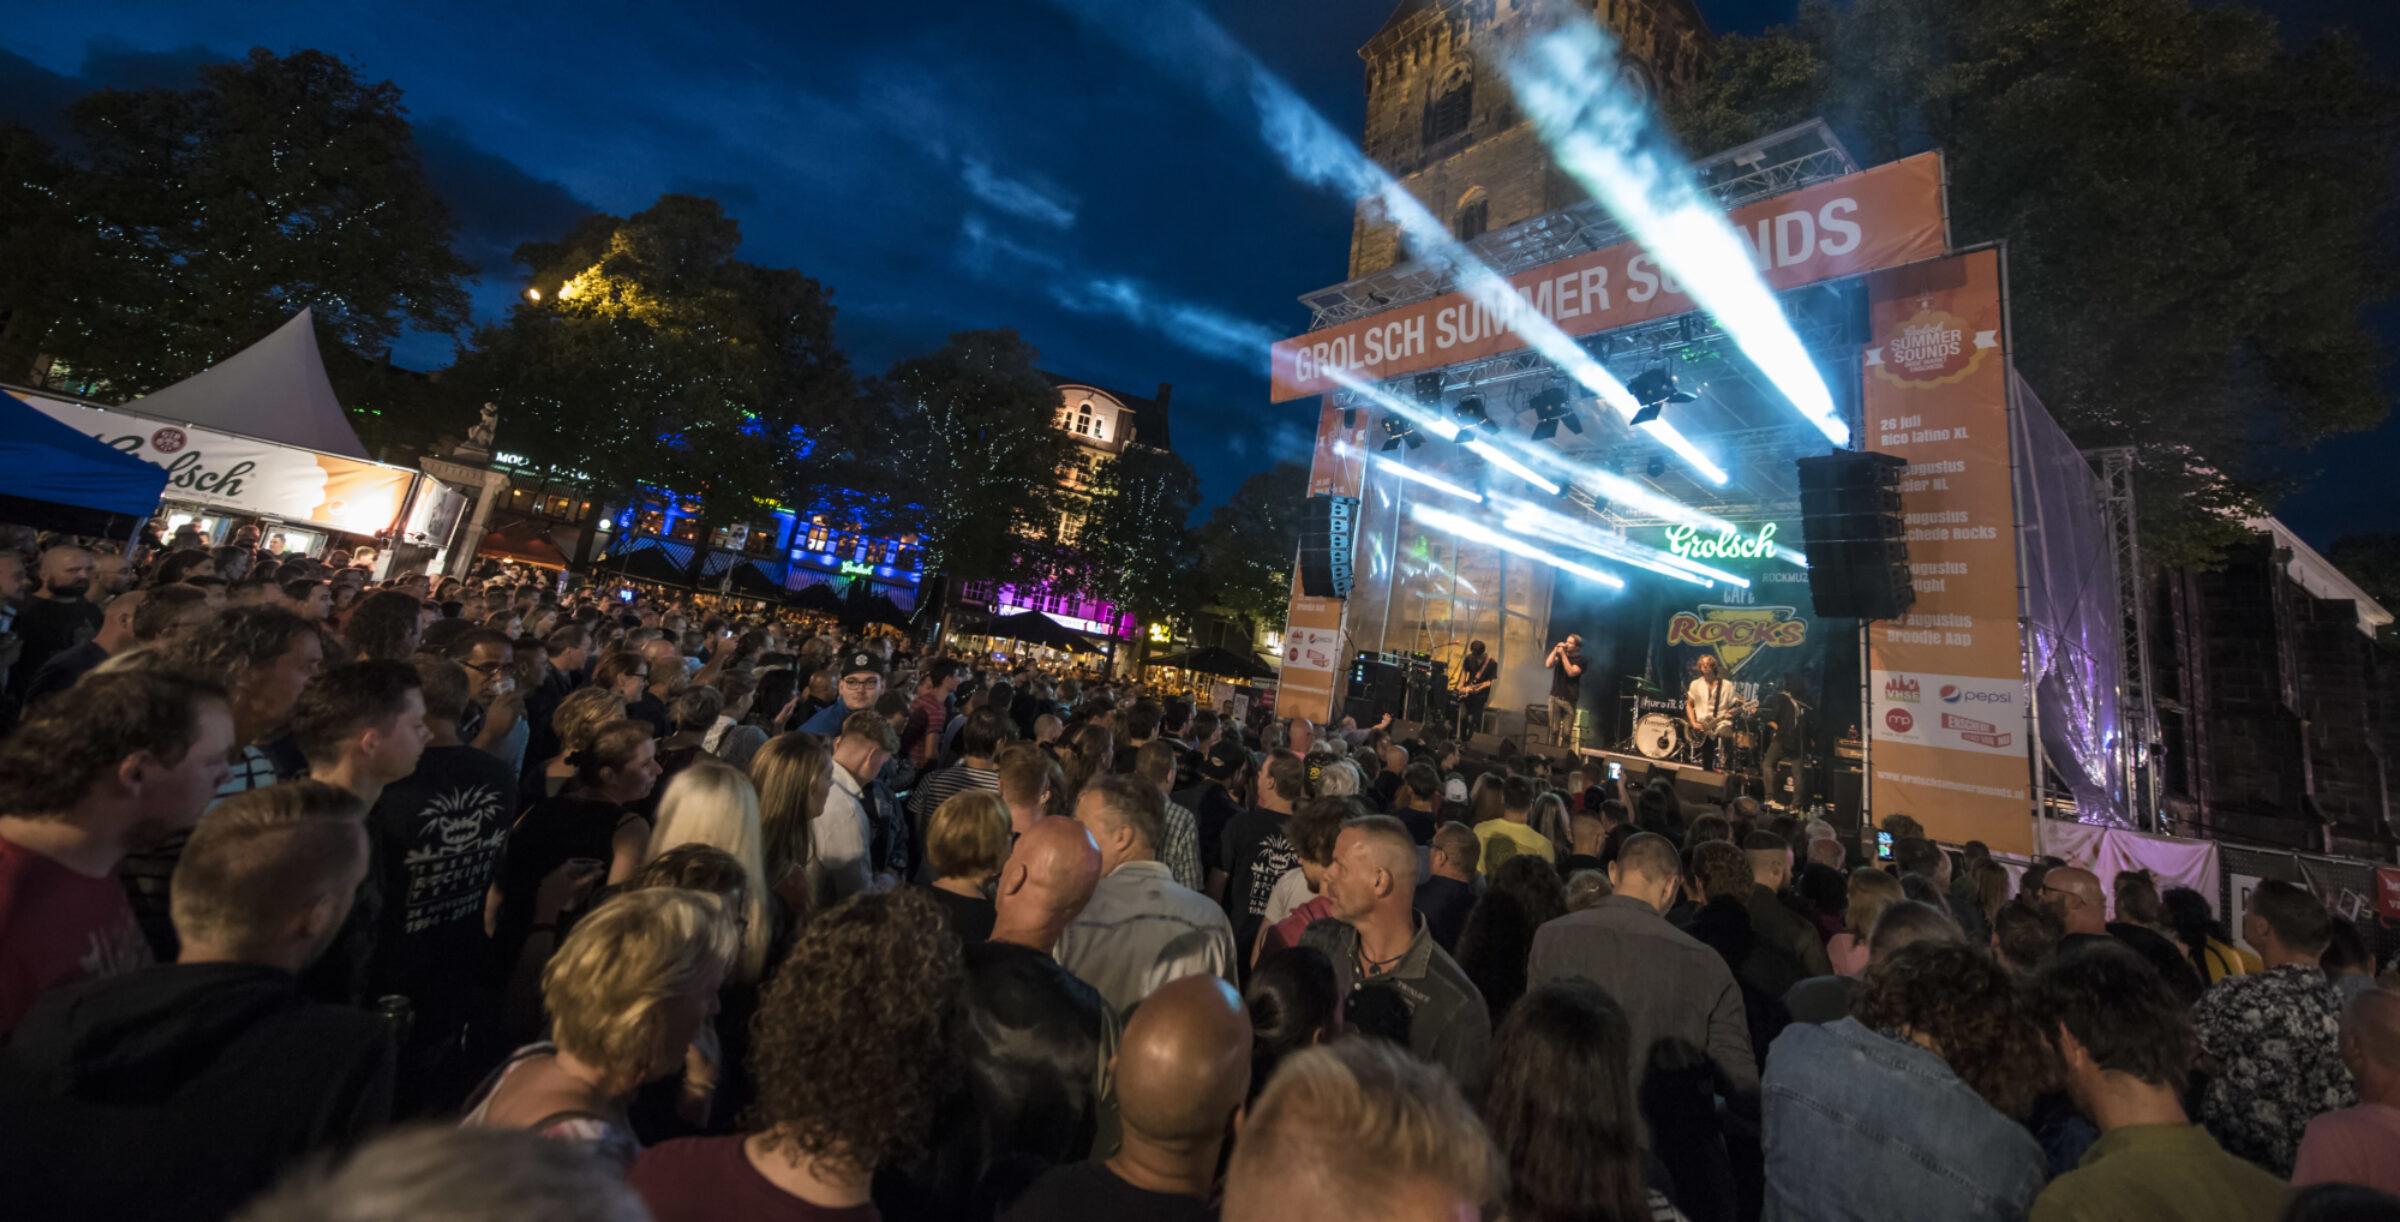 2018 Roy Te Lintelo Grolsch Summer Sounds Enschede Rocks evenementen 11